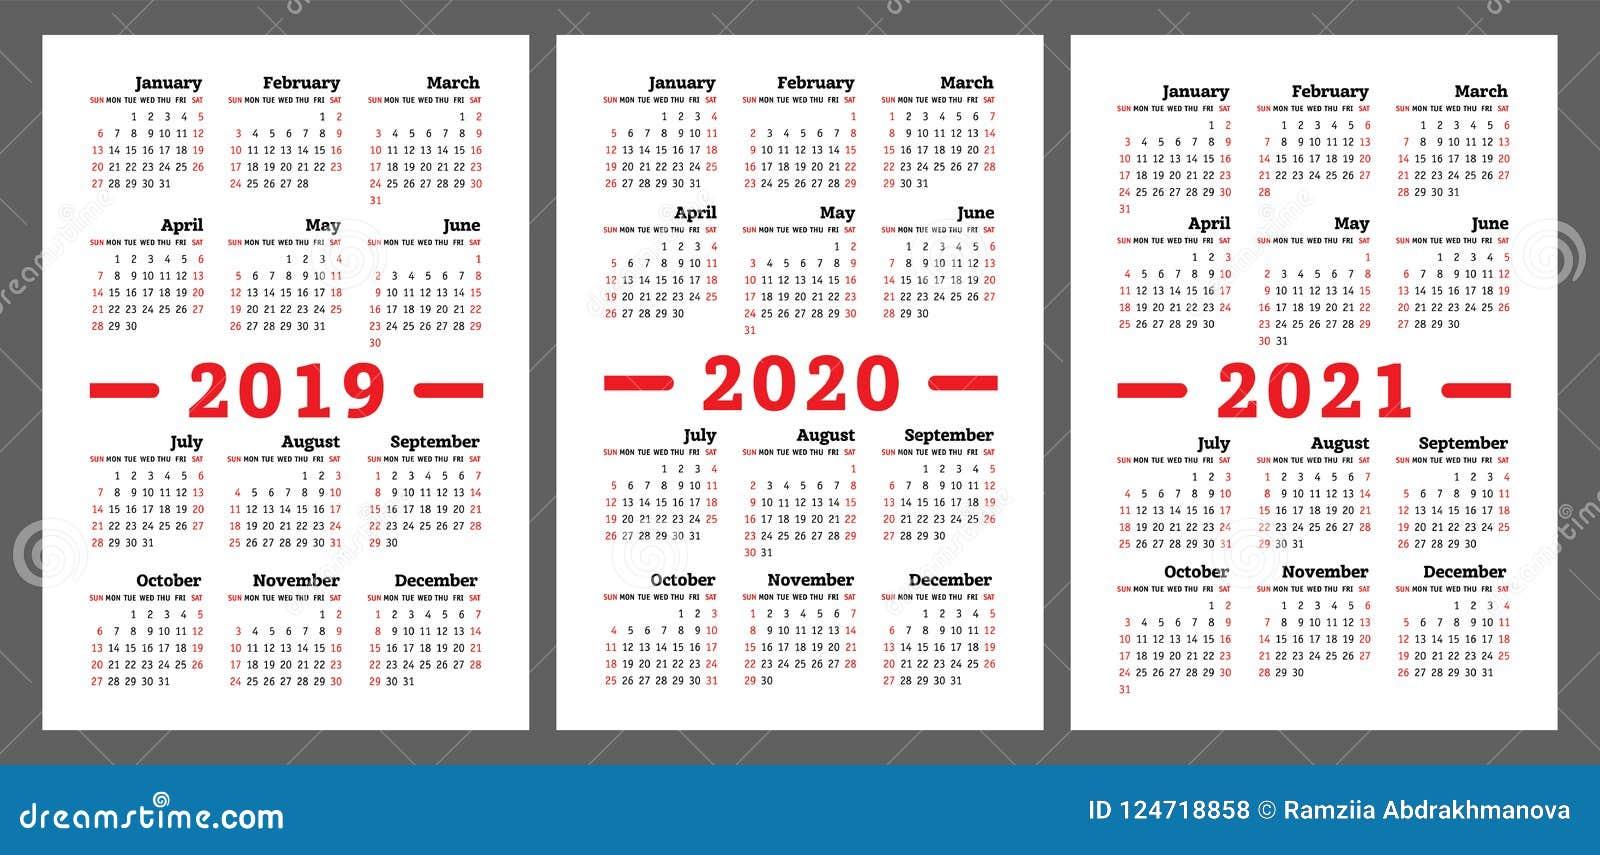 Calendario Numero Settimana 2019.Calendario 2019 2020 2021 Anno Insieme Variopinto Di